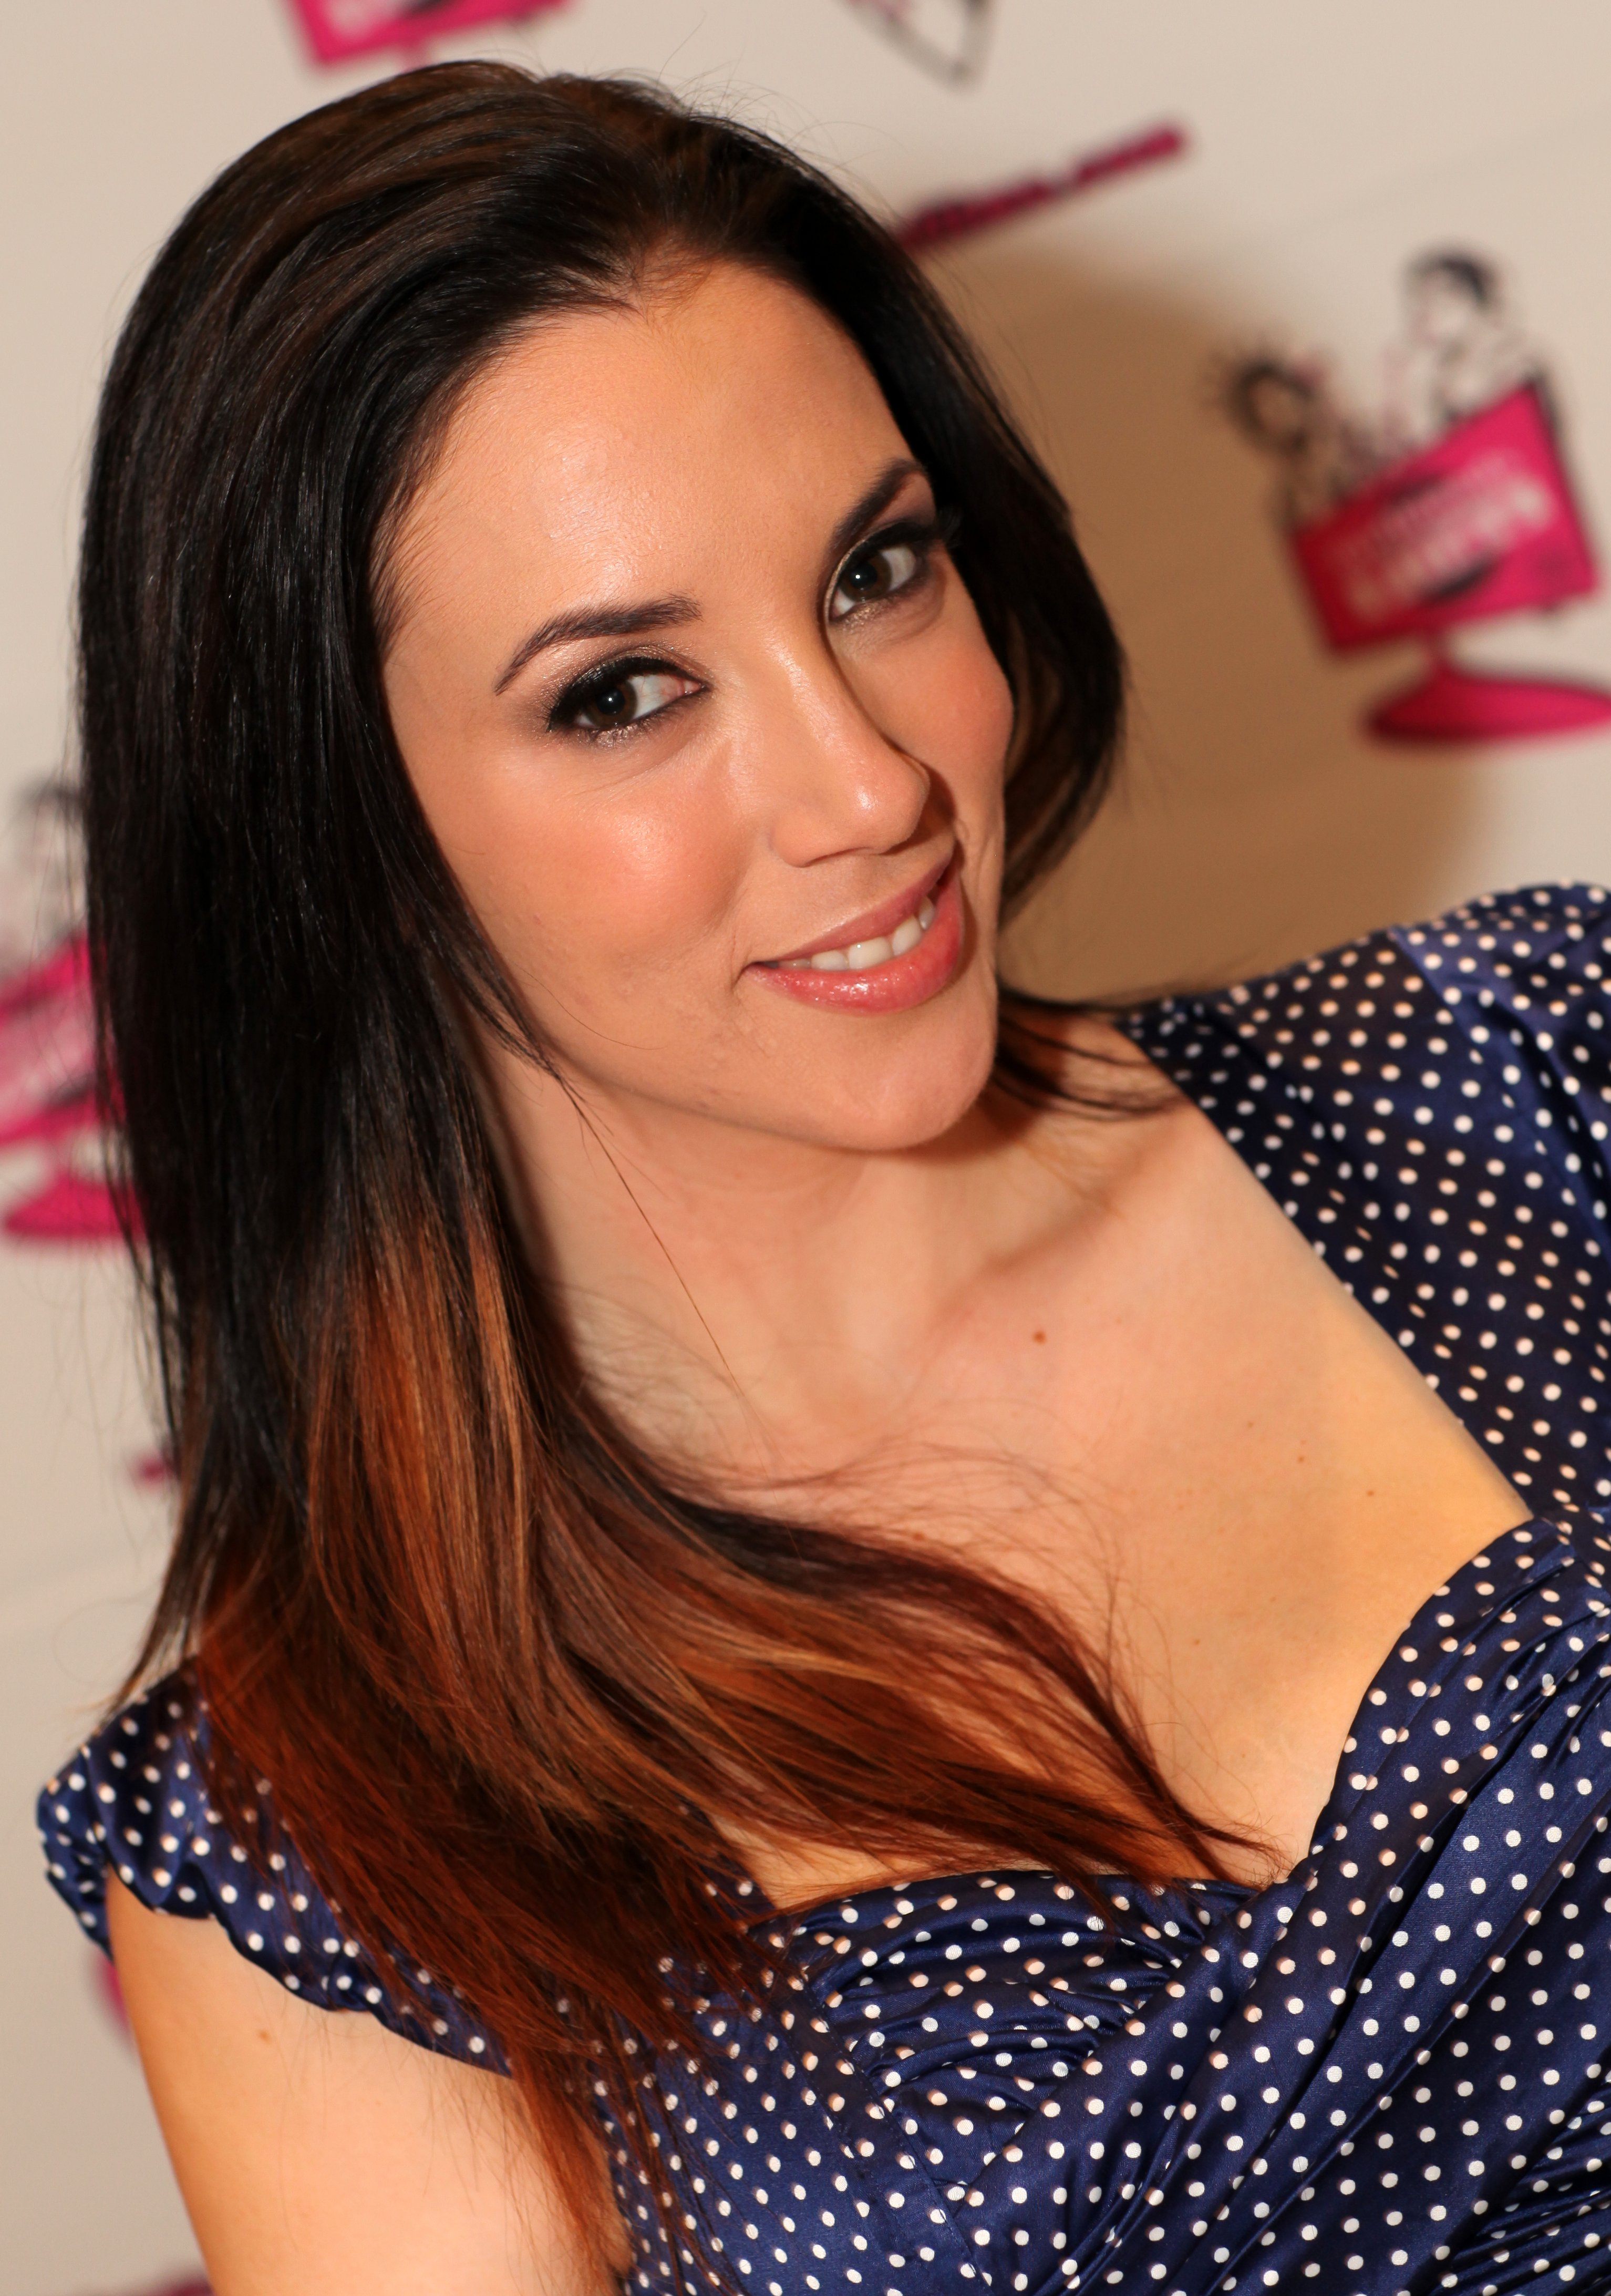 File:Jelena Jensen - 2013 AVN Expo Photos Las Vegas